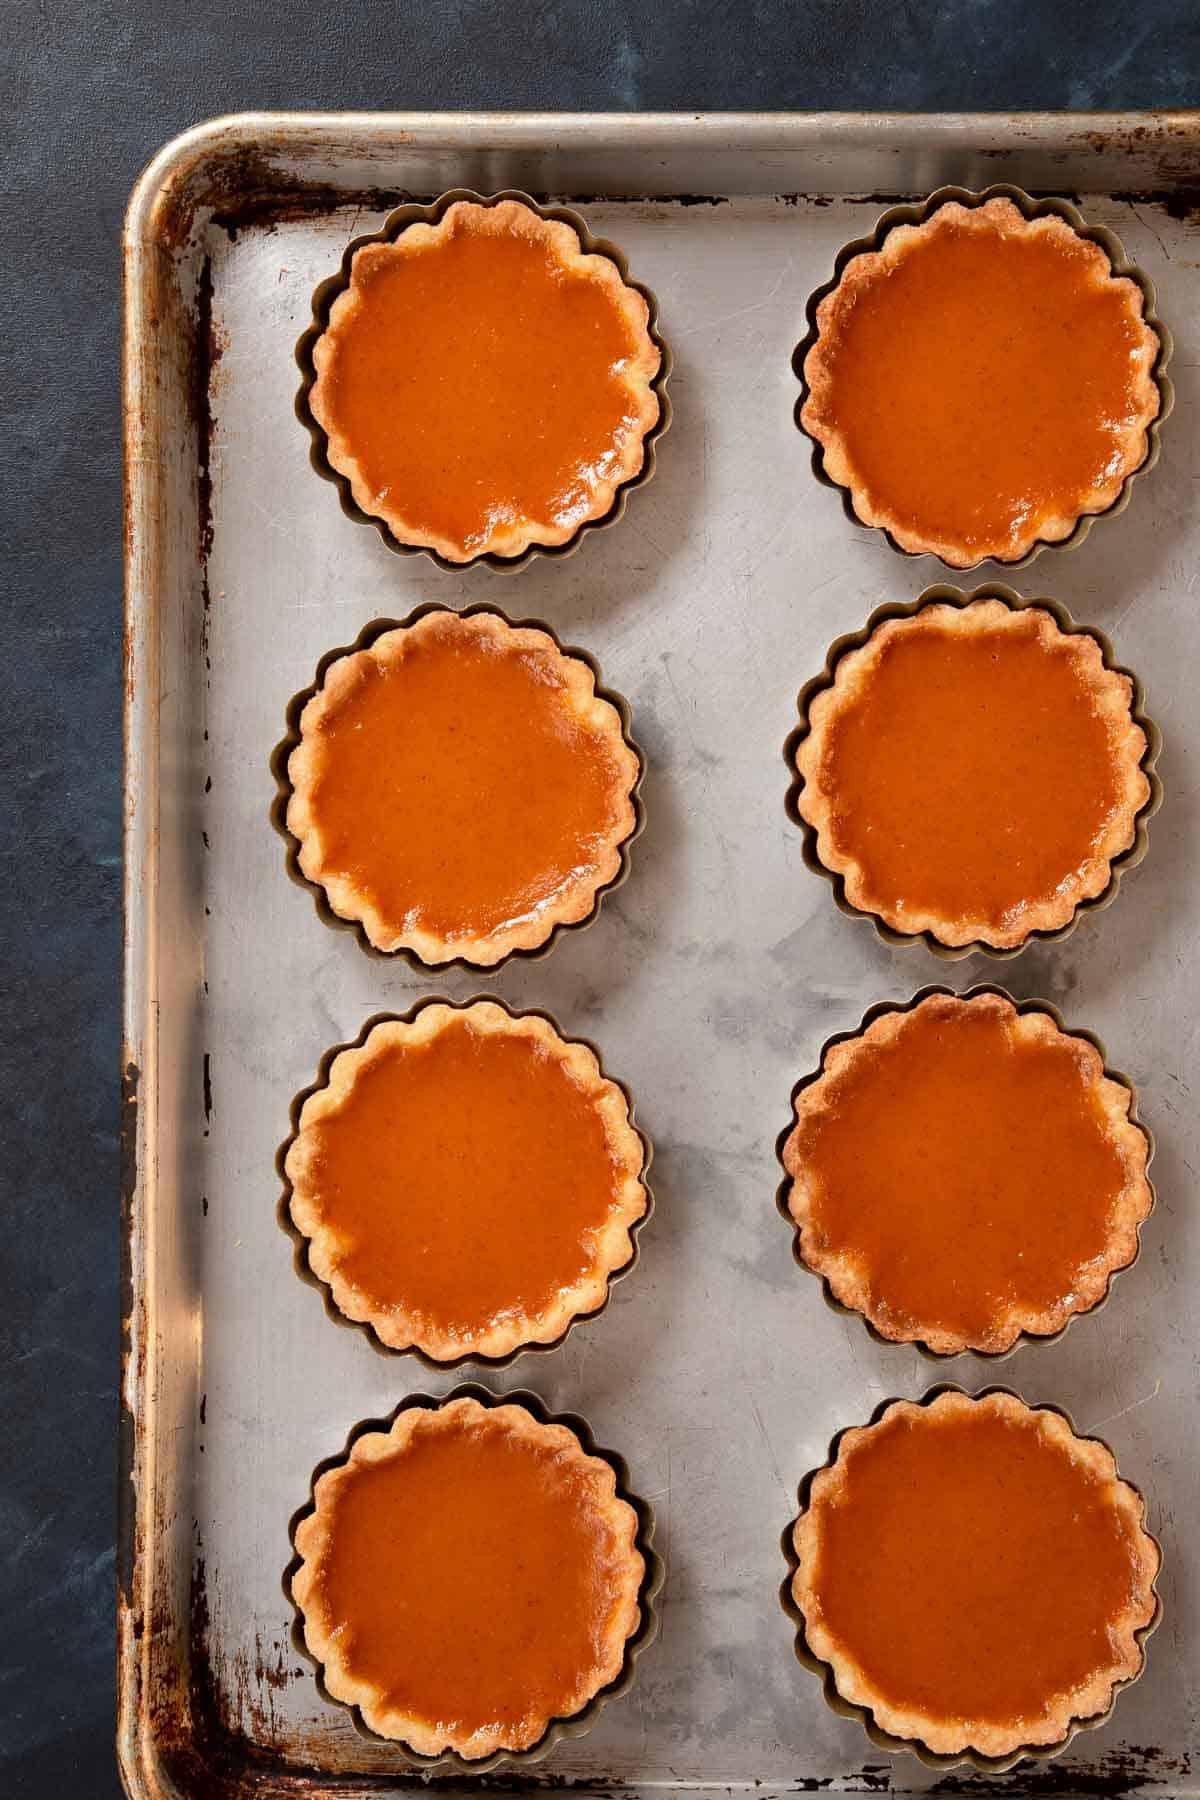 Baked individual pumpkin pie tarts